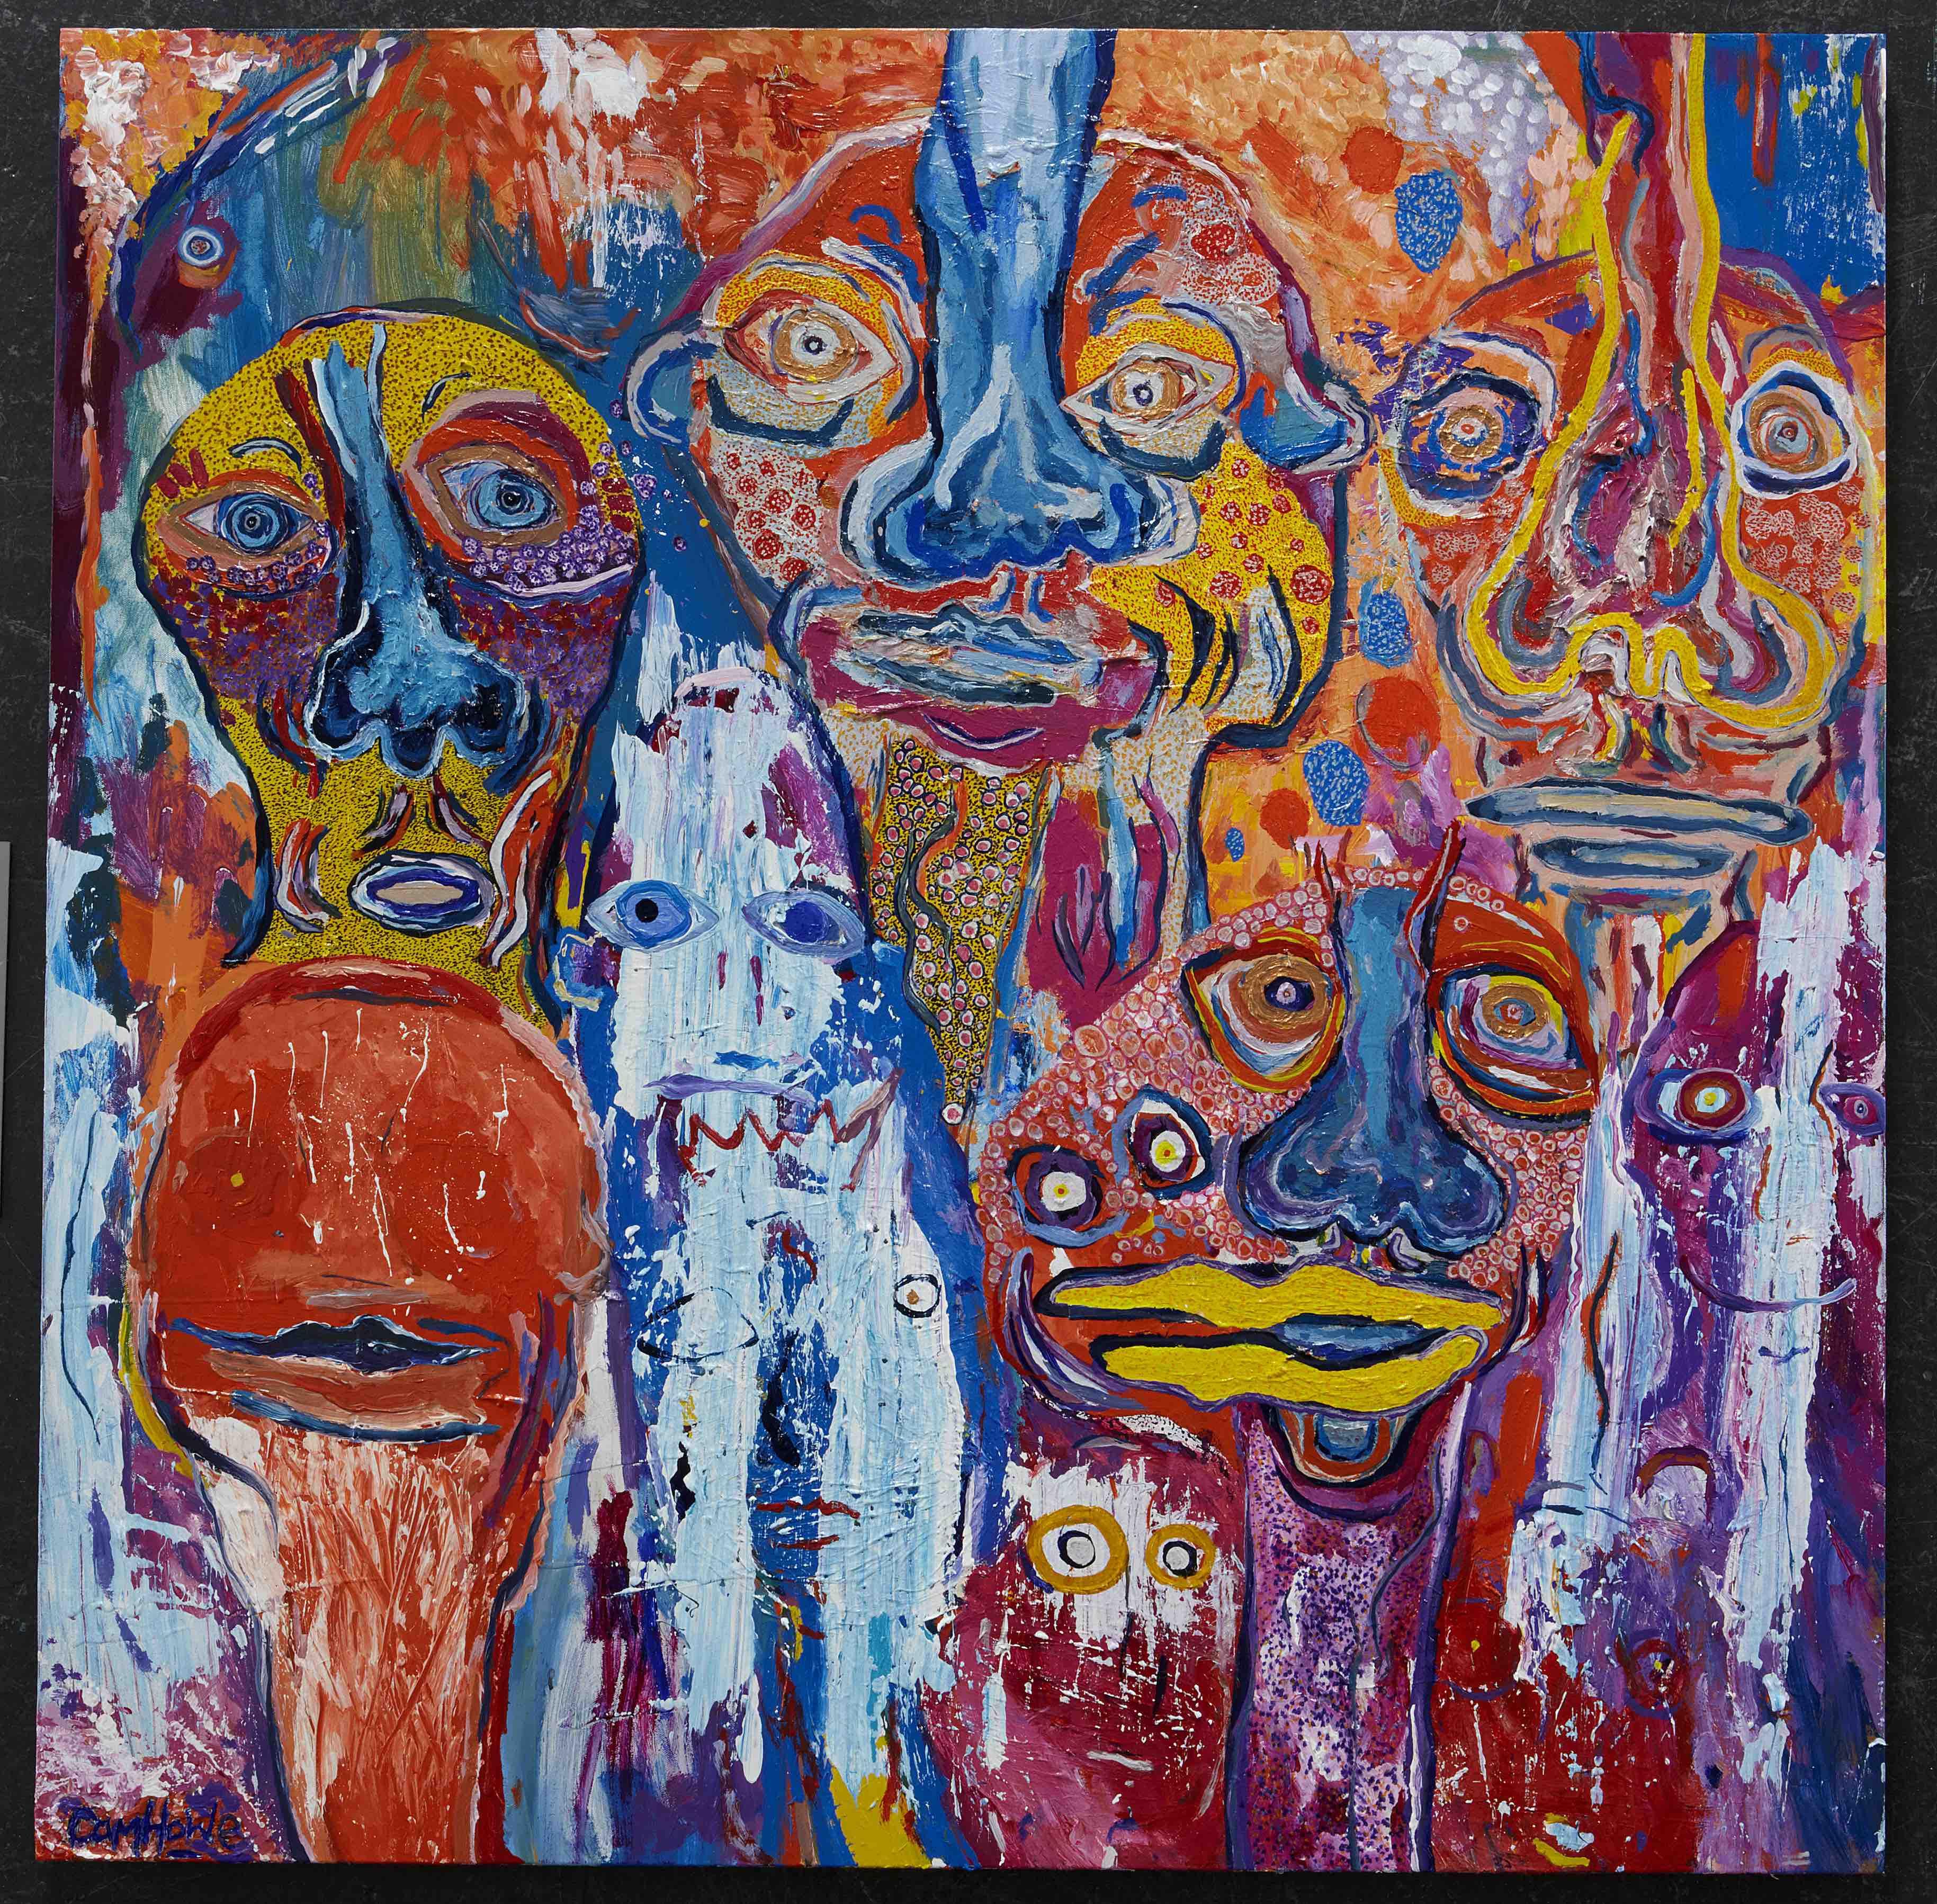 Ten Faces by Cameron Howe. Immersion exhibition, Frankston Arts Centre